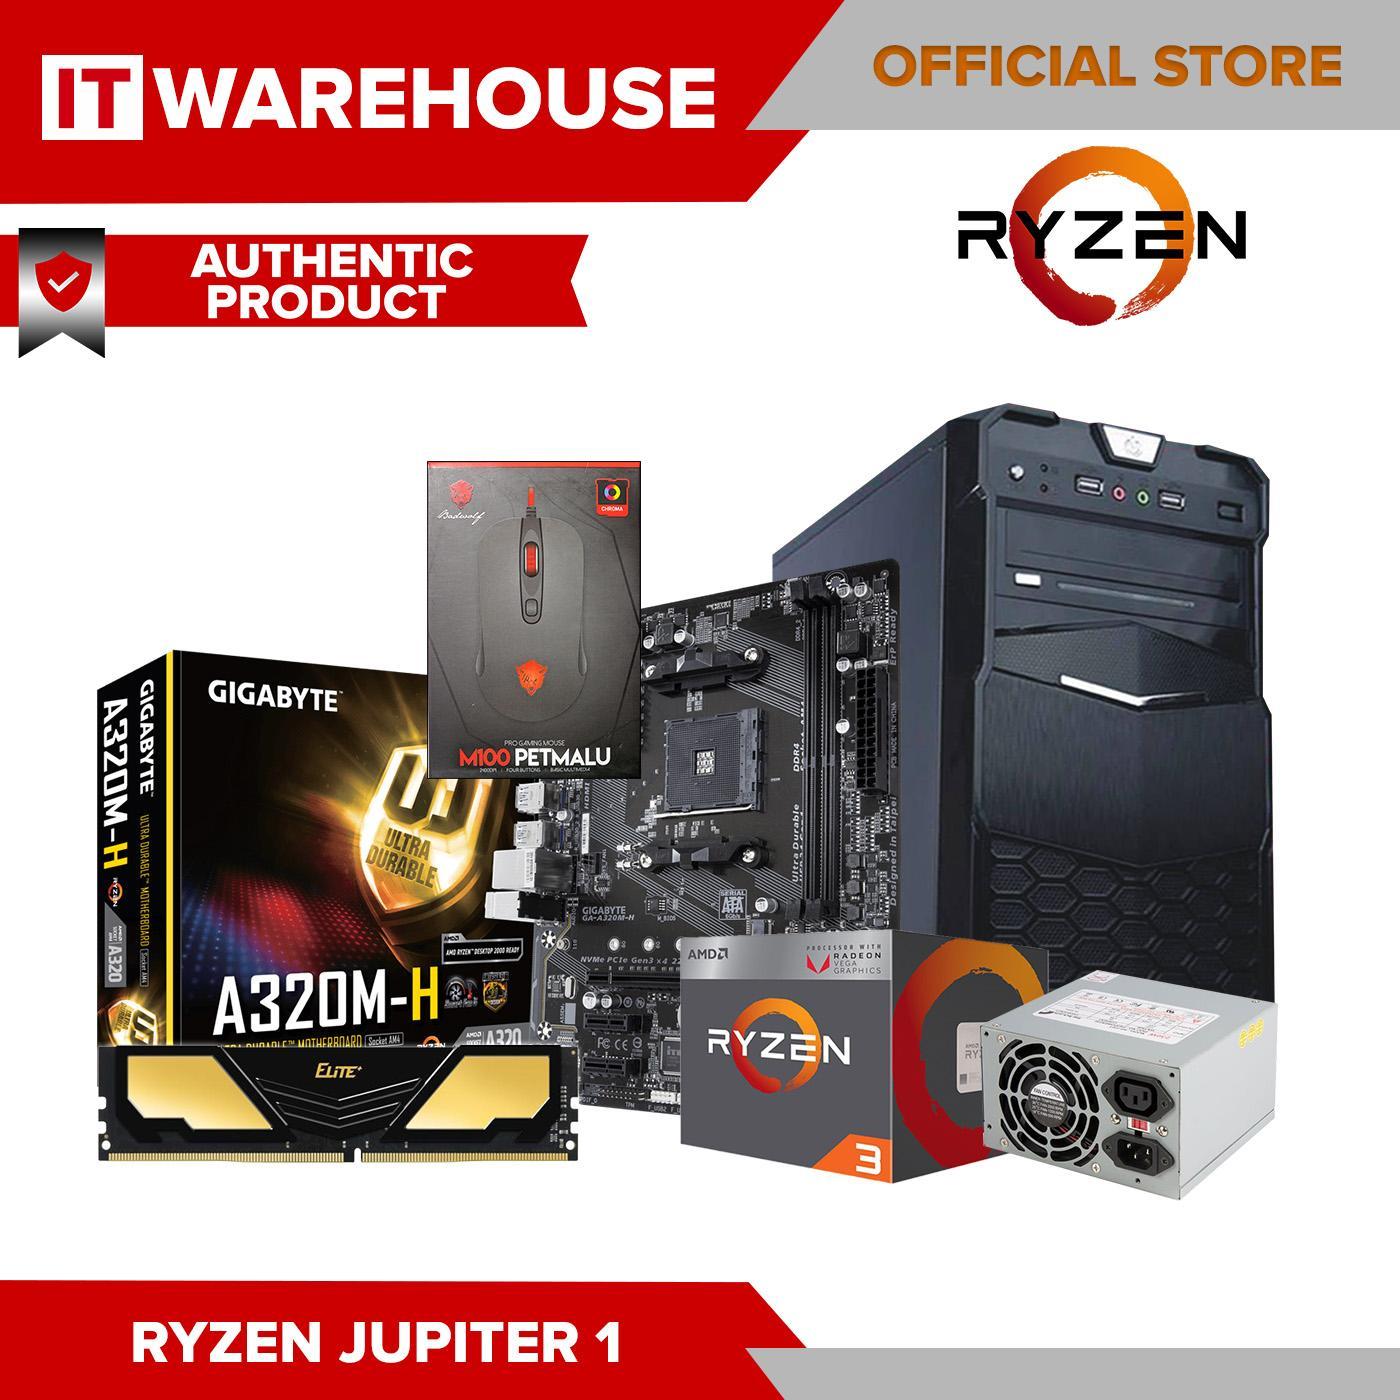 AMD Ryzen 3 2200G Diskless System Package Quad-Core 3 5 GHz Socket AM4 65W  with Radeon Vega 8 Graphics iGPU Desktop Processor DISKLESS System UNIT CPU